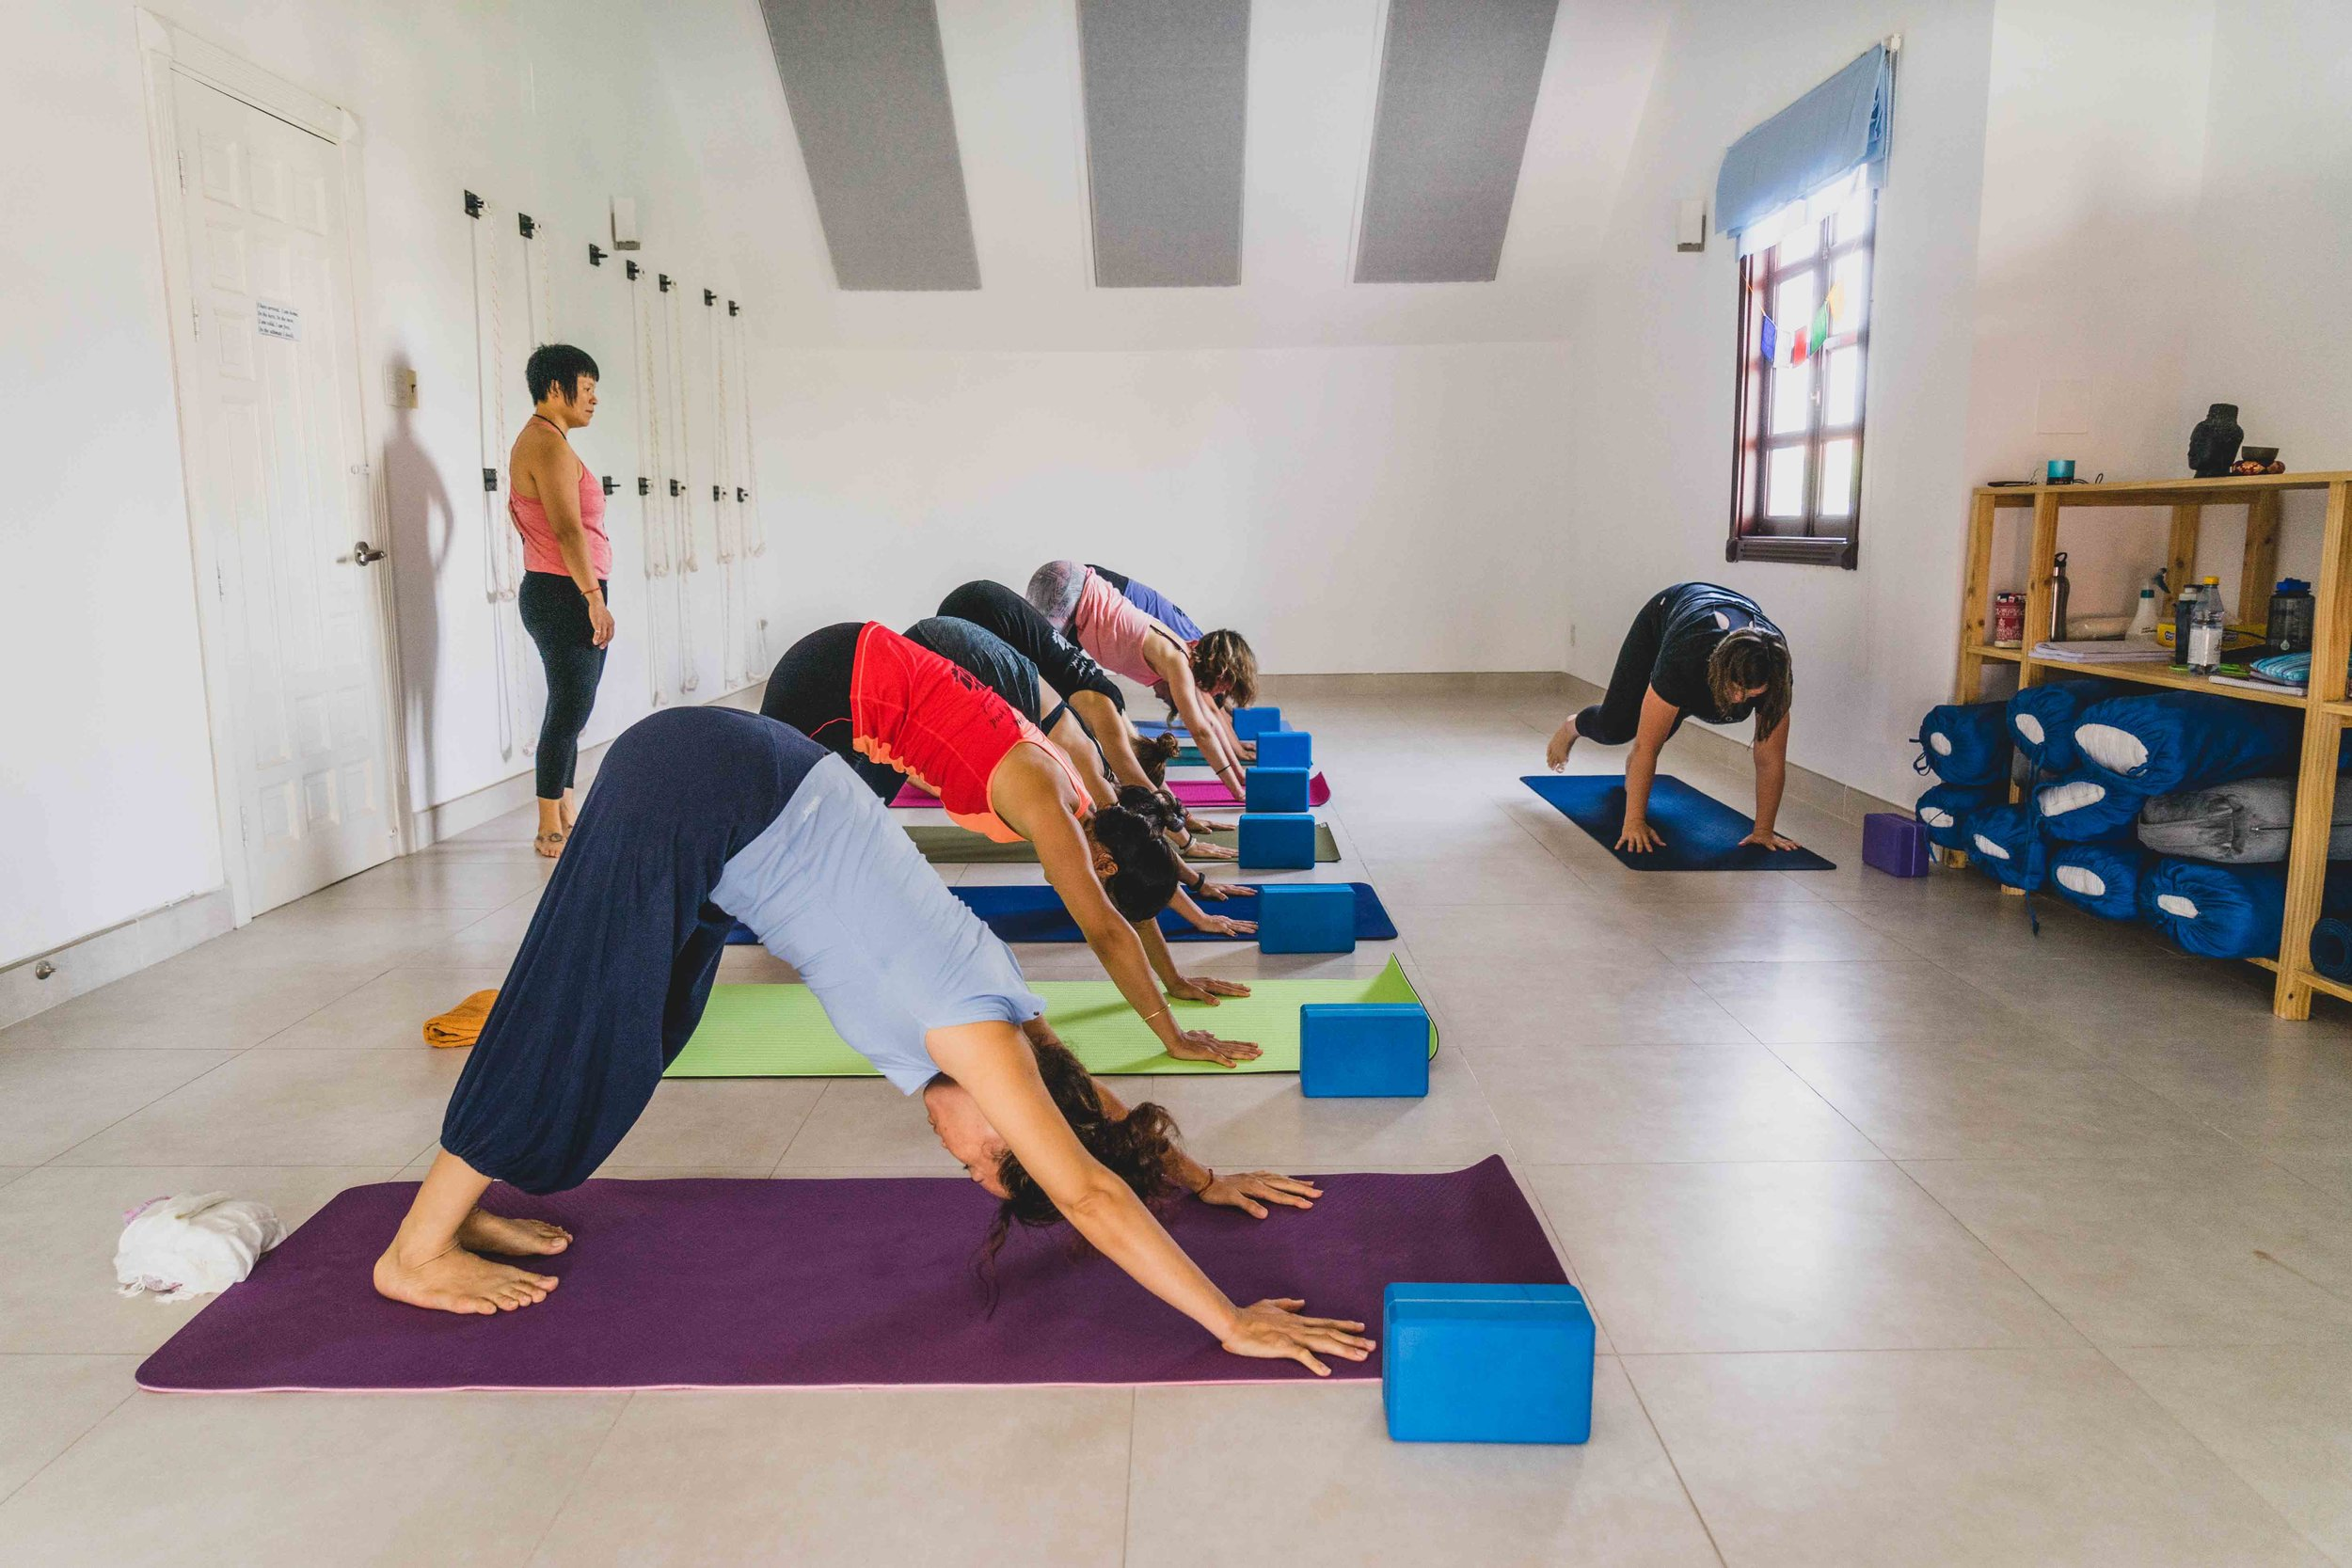 200-hour-yoga-teacher-training-kingston-ontario-canada